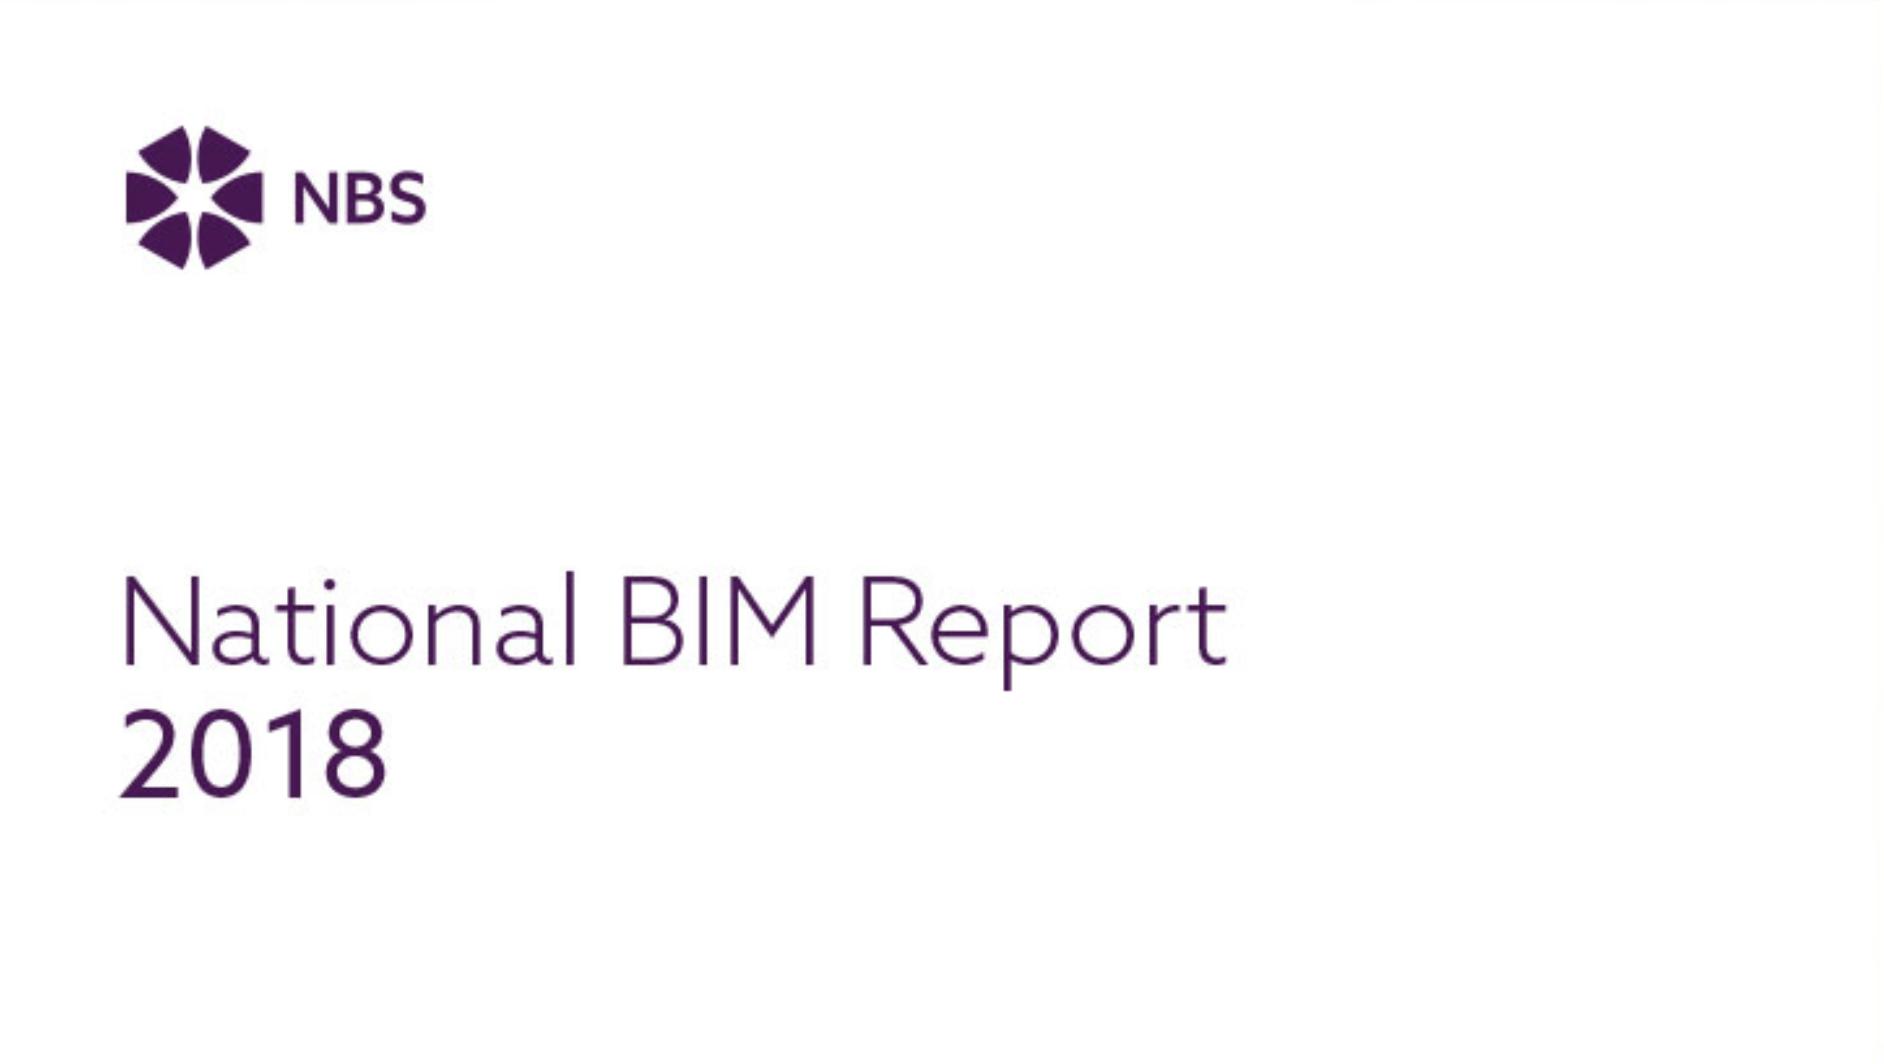 NBS national BIM report